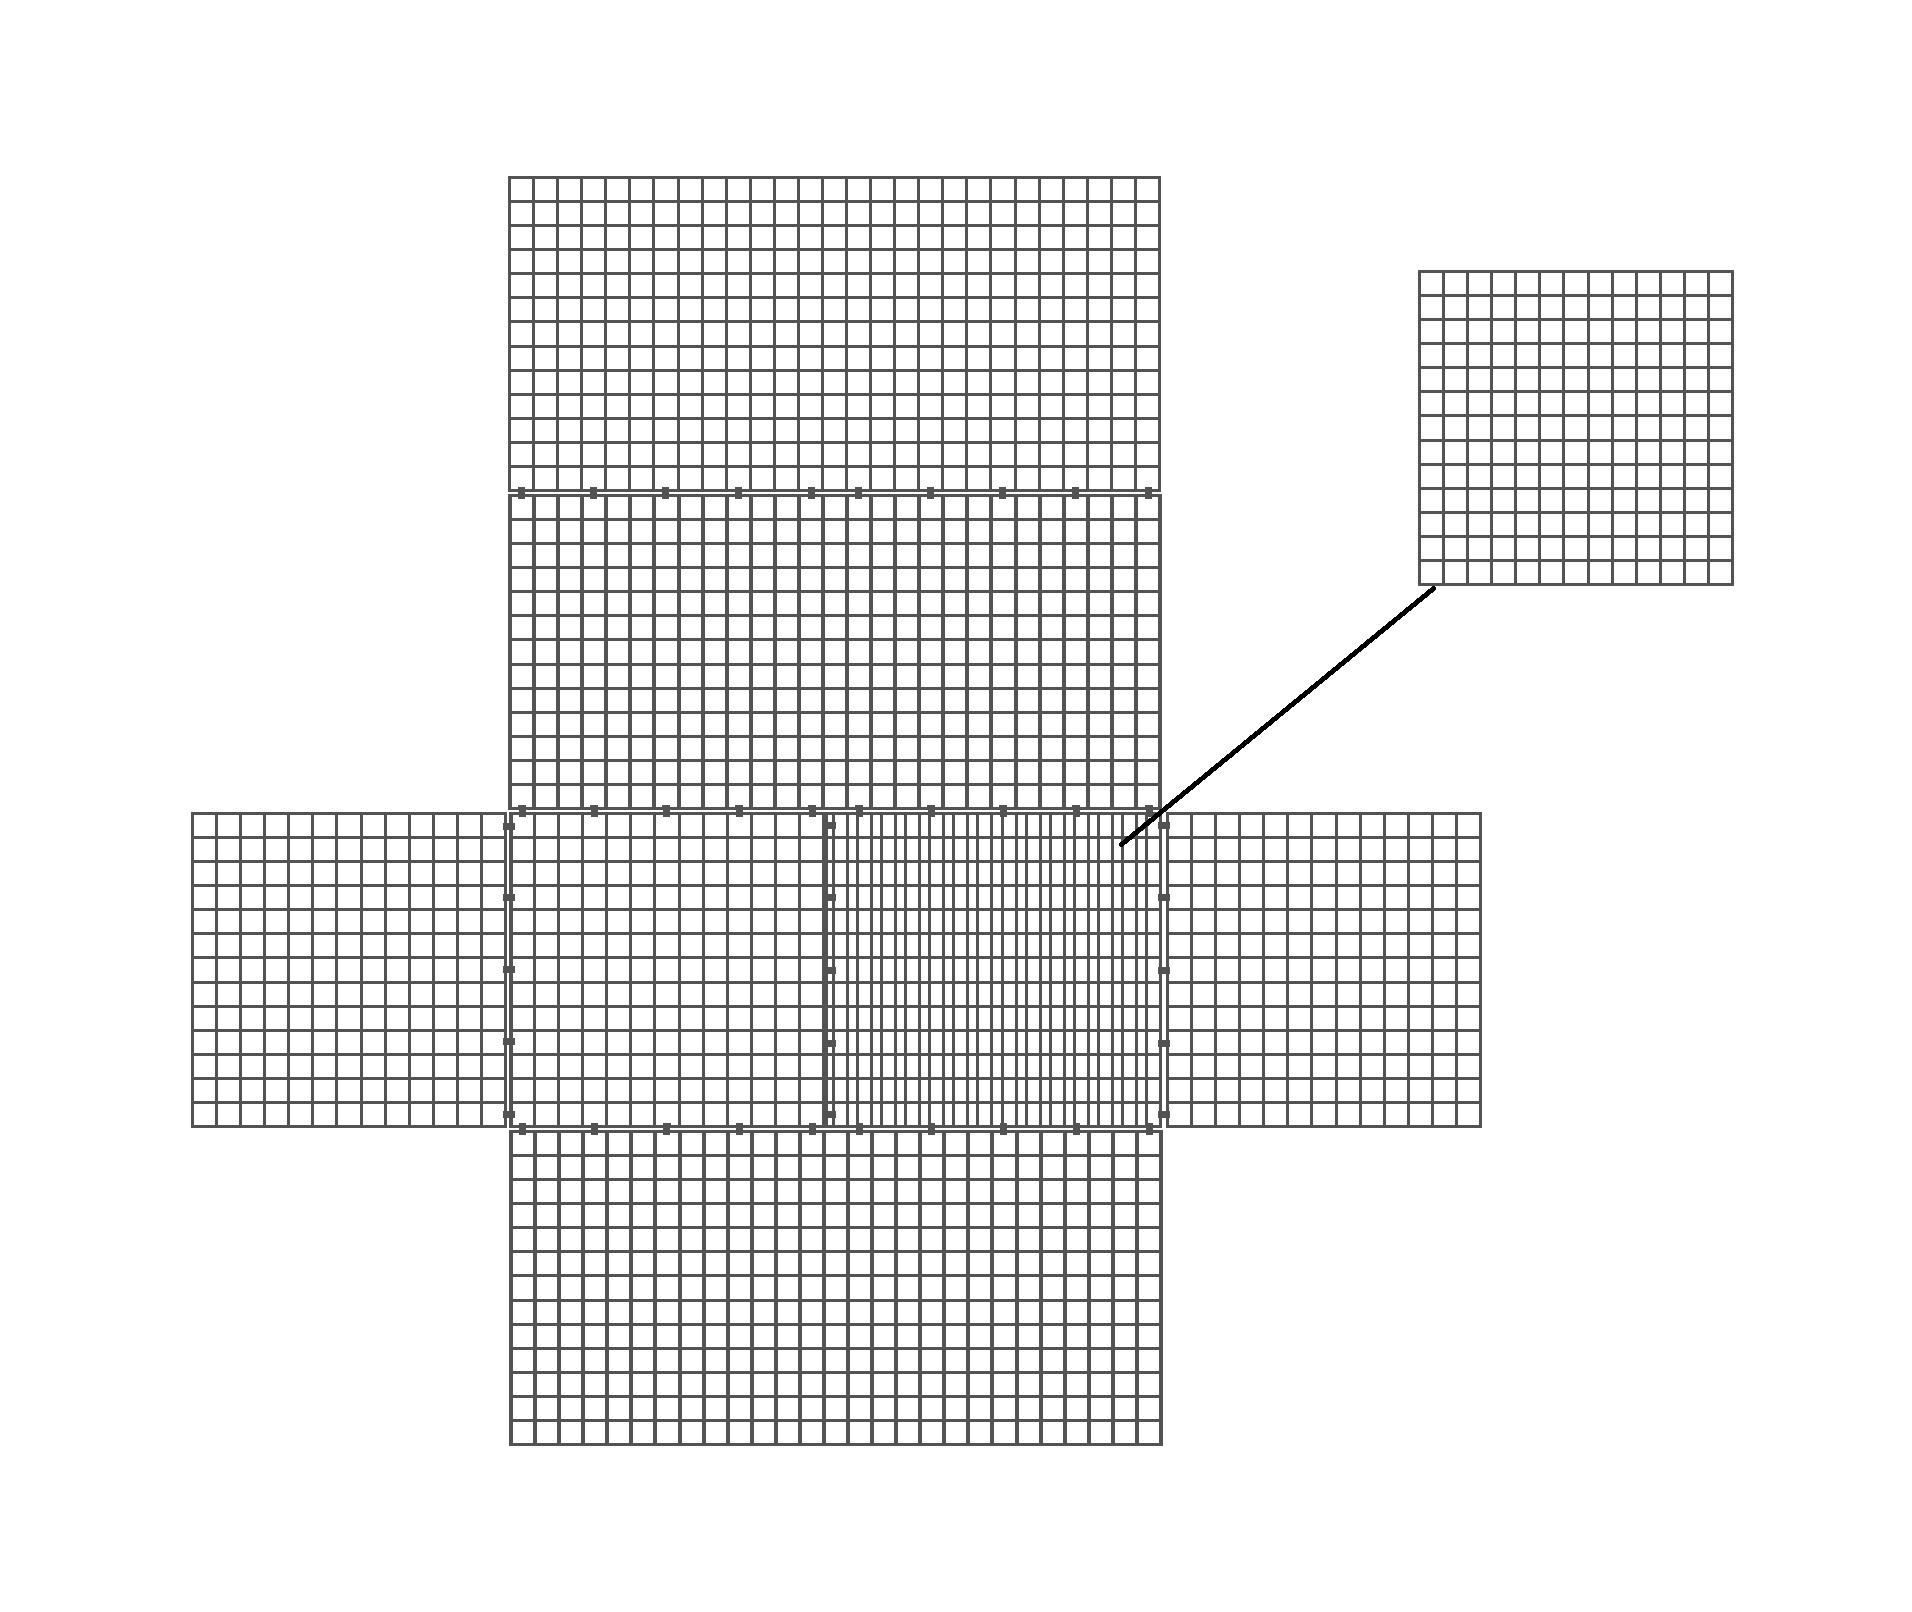 Retaining wall gabion baskets 2m x 1m x 1m cages for Fenetre 2m x 1m